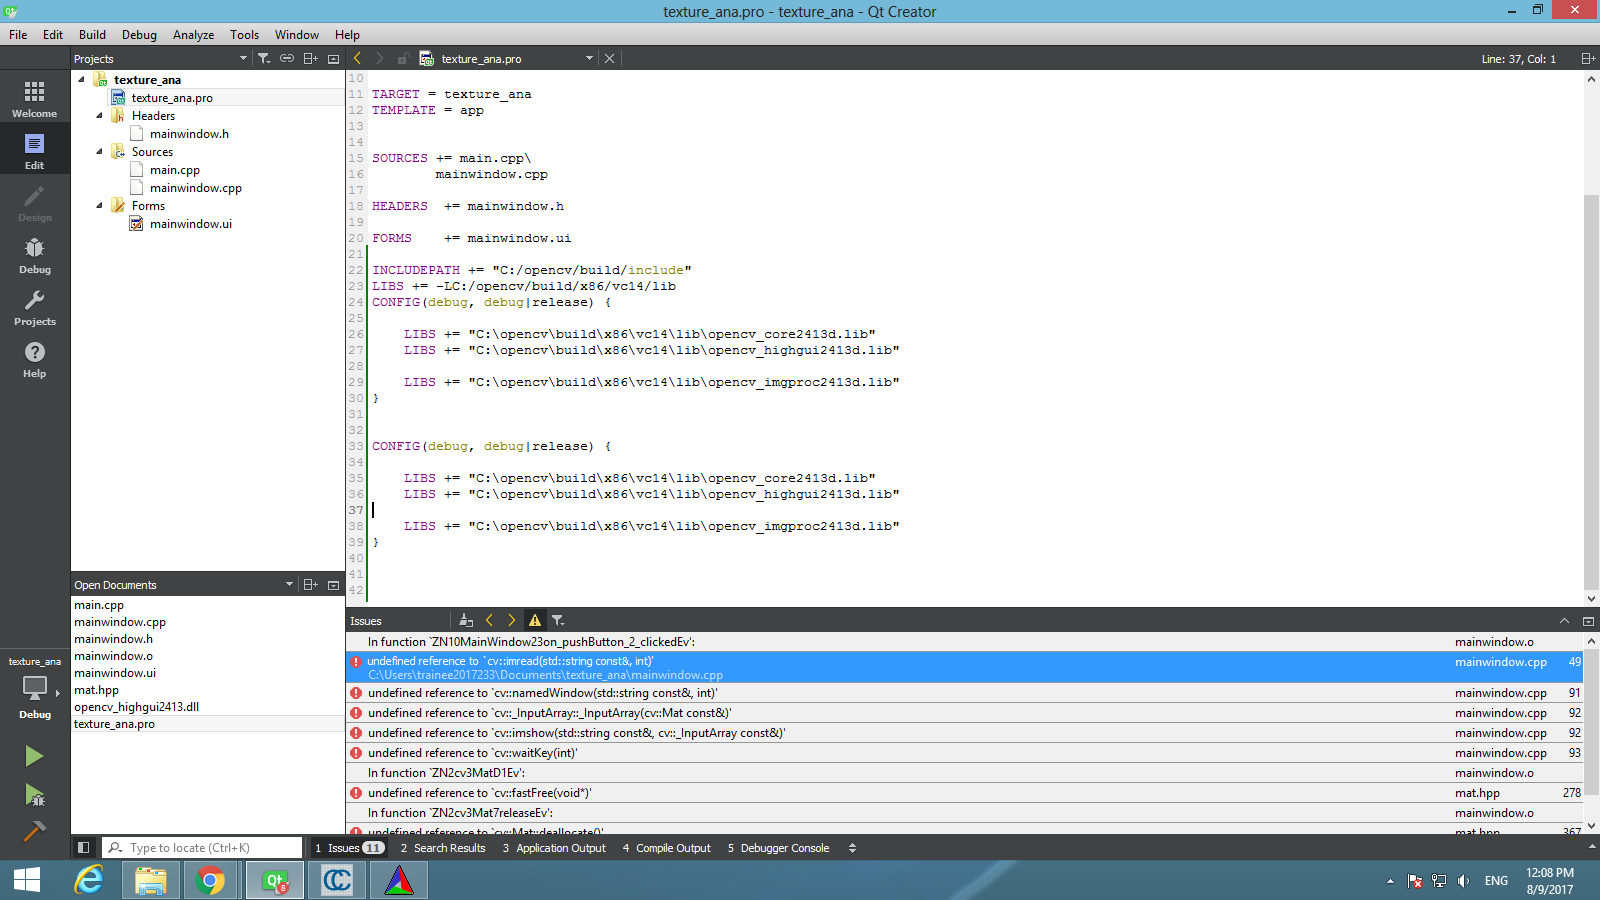 0_1502260775727_Screenshot (7).png